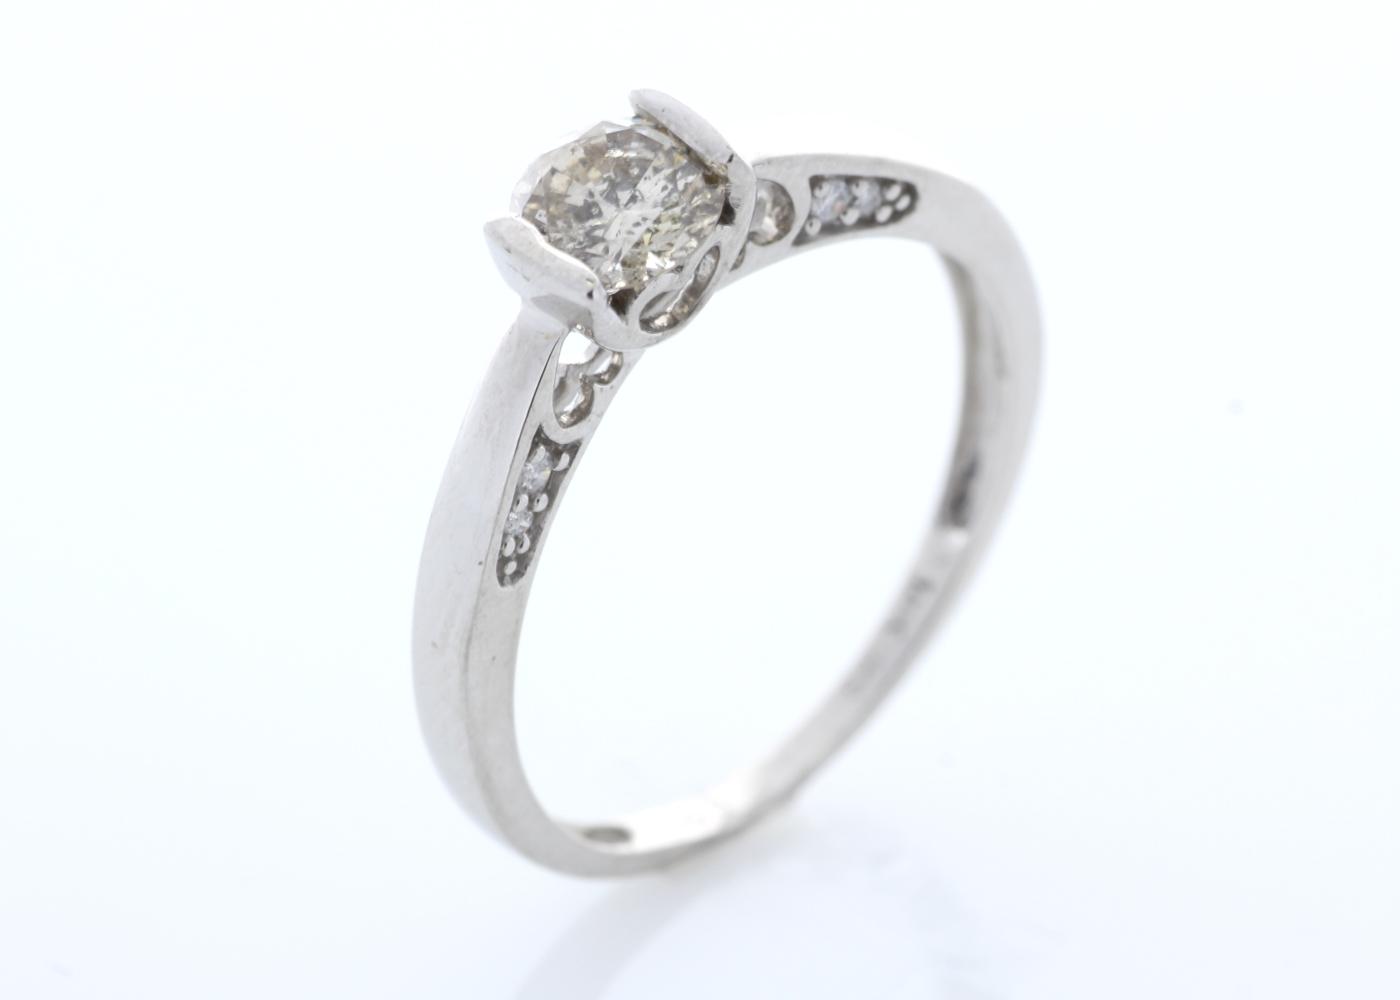 Lot 21 - 18ct White Gold Single Stone Prong Set With Stone Set Shoulders Diamond Ring 0.60 Carats